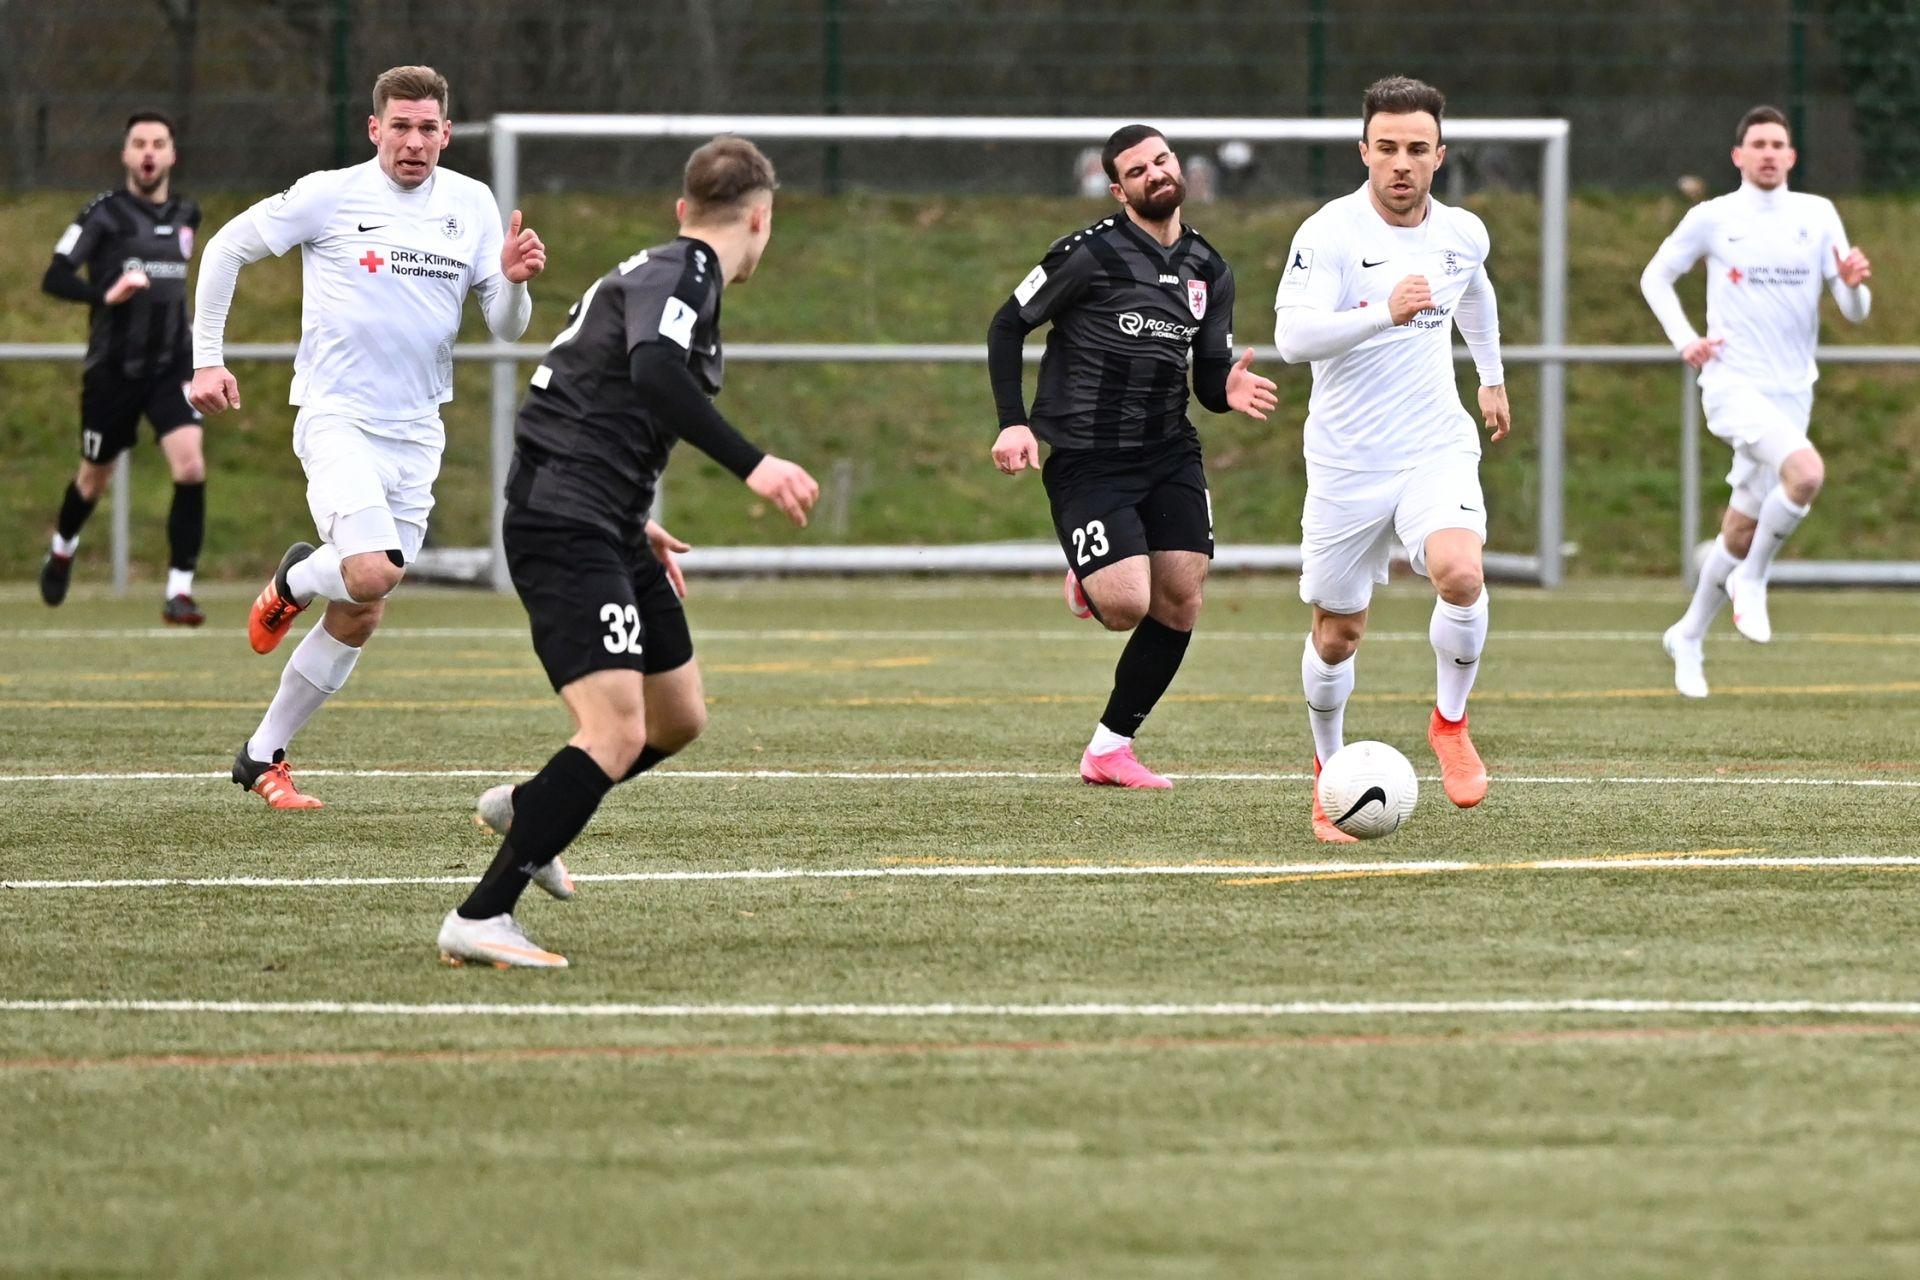 Regionalliga Südwest 2020/21, KSVHessen Kassel, FC Gießen, Endstand 1:1, Sebastian Schmeer, Alban Meha